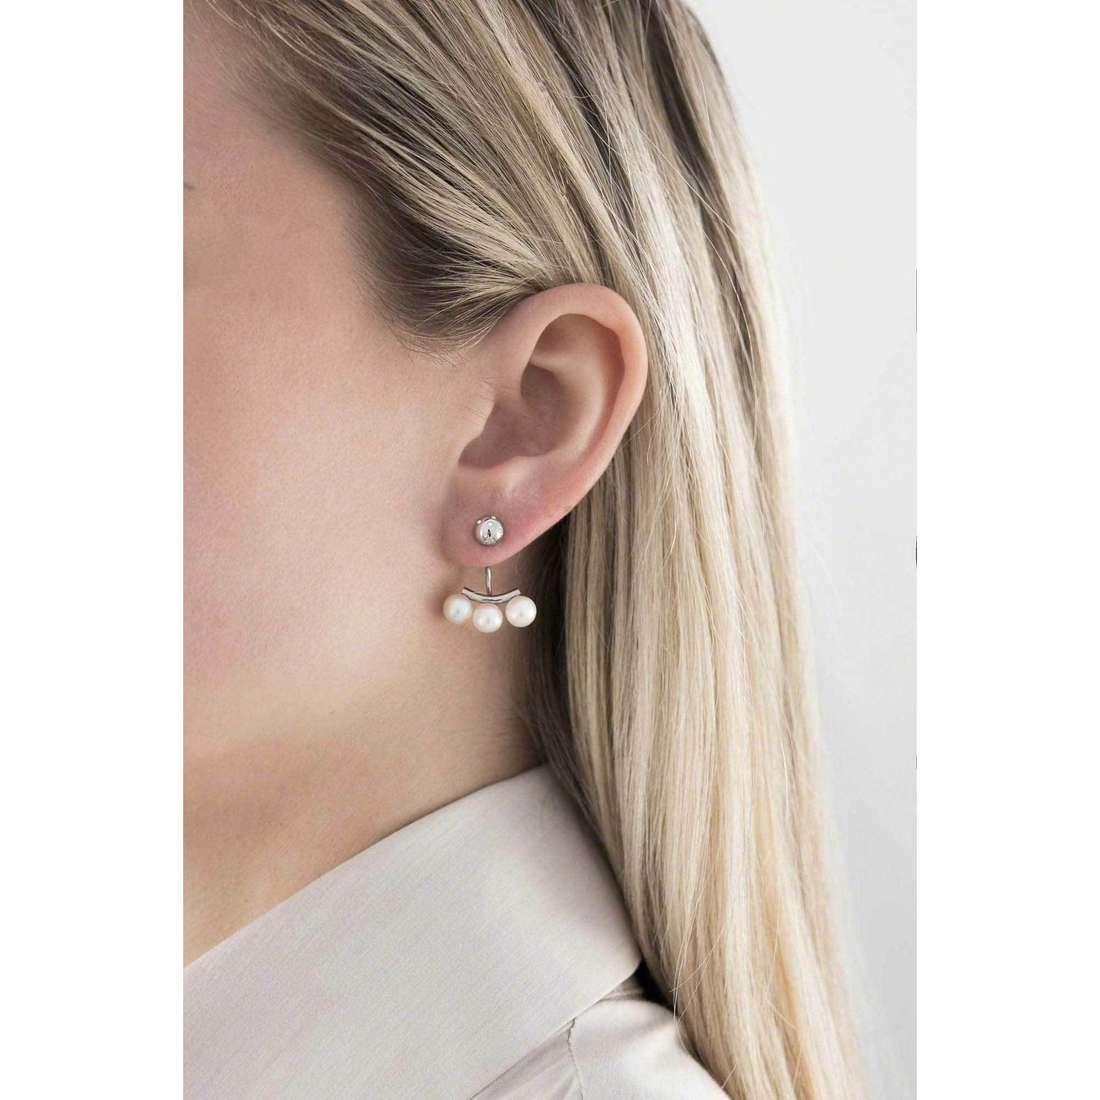 Morellato earrings Lunae woman SADX10 indosso